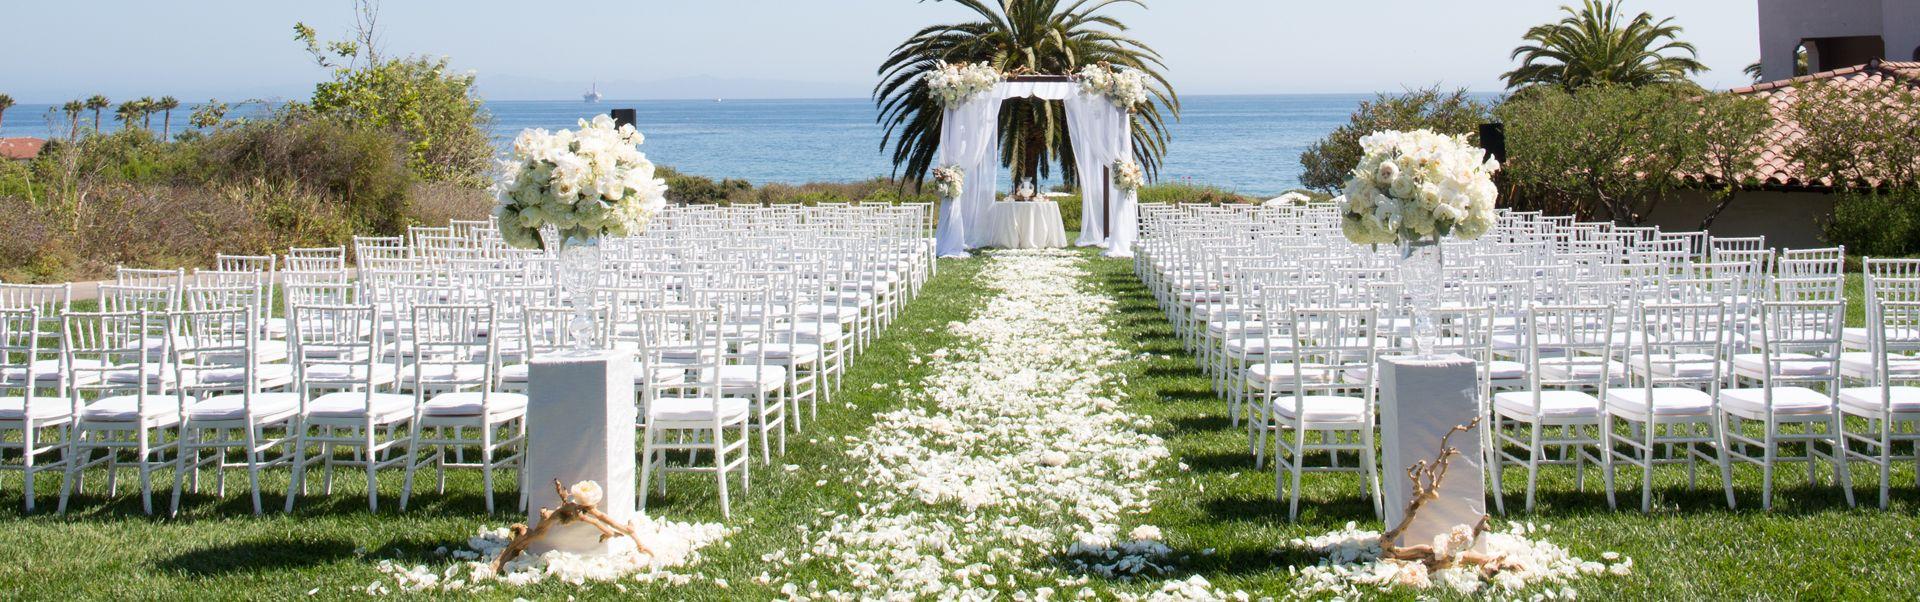 Gorgeous Santa Barbara Weddings Beachfront Venues By Bacara Resort Weddingssantabarbara Santa Barbara Wedding Venue Ocean View Wedding Santa Barbara Wedding